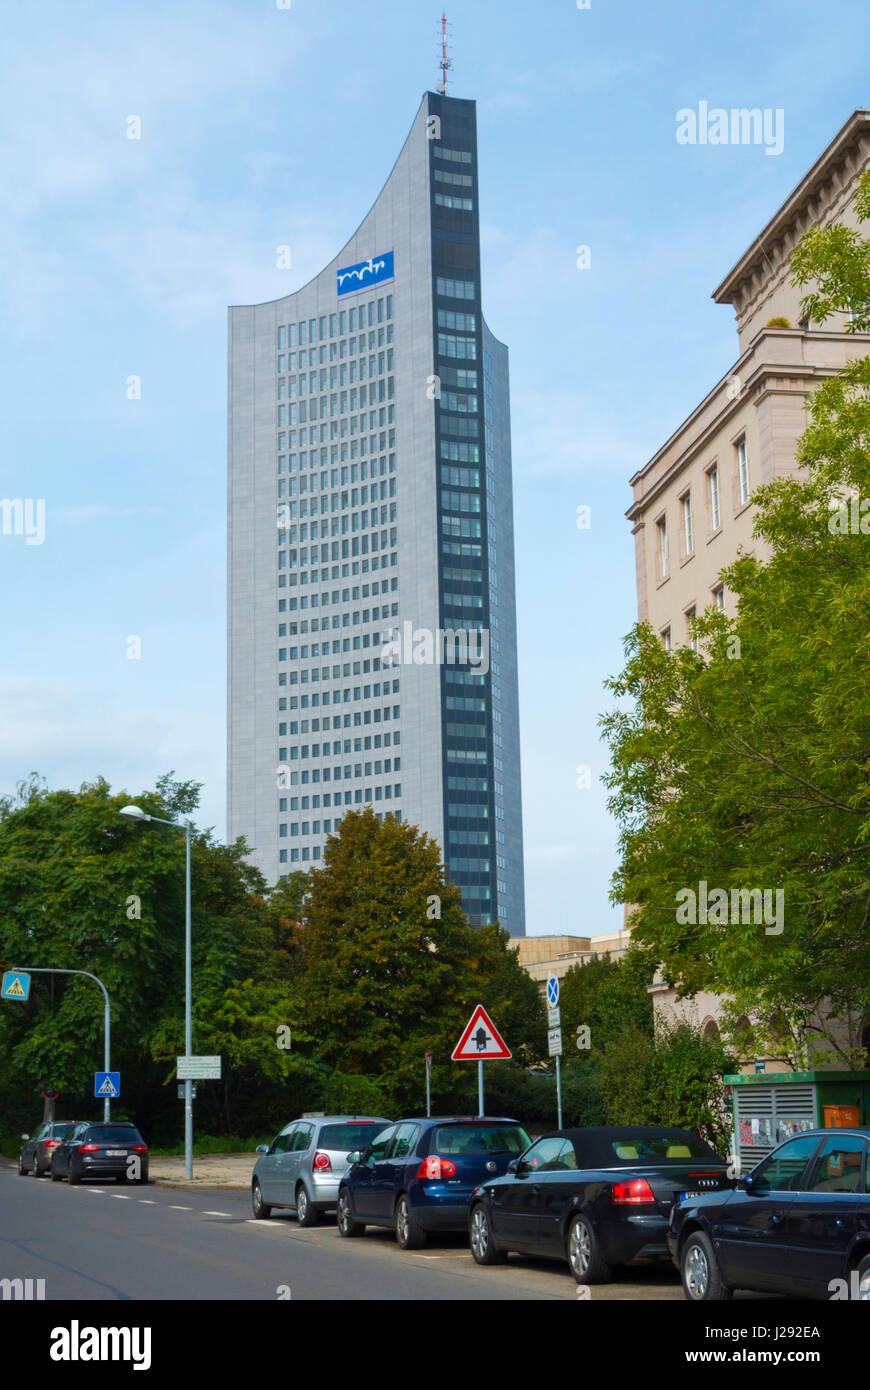 City-Hochhaus, Panorama Tower, Augustusplatz, Leipzig, Saxony, Germany - Stock Image